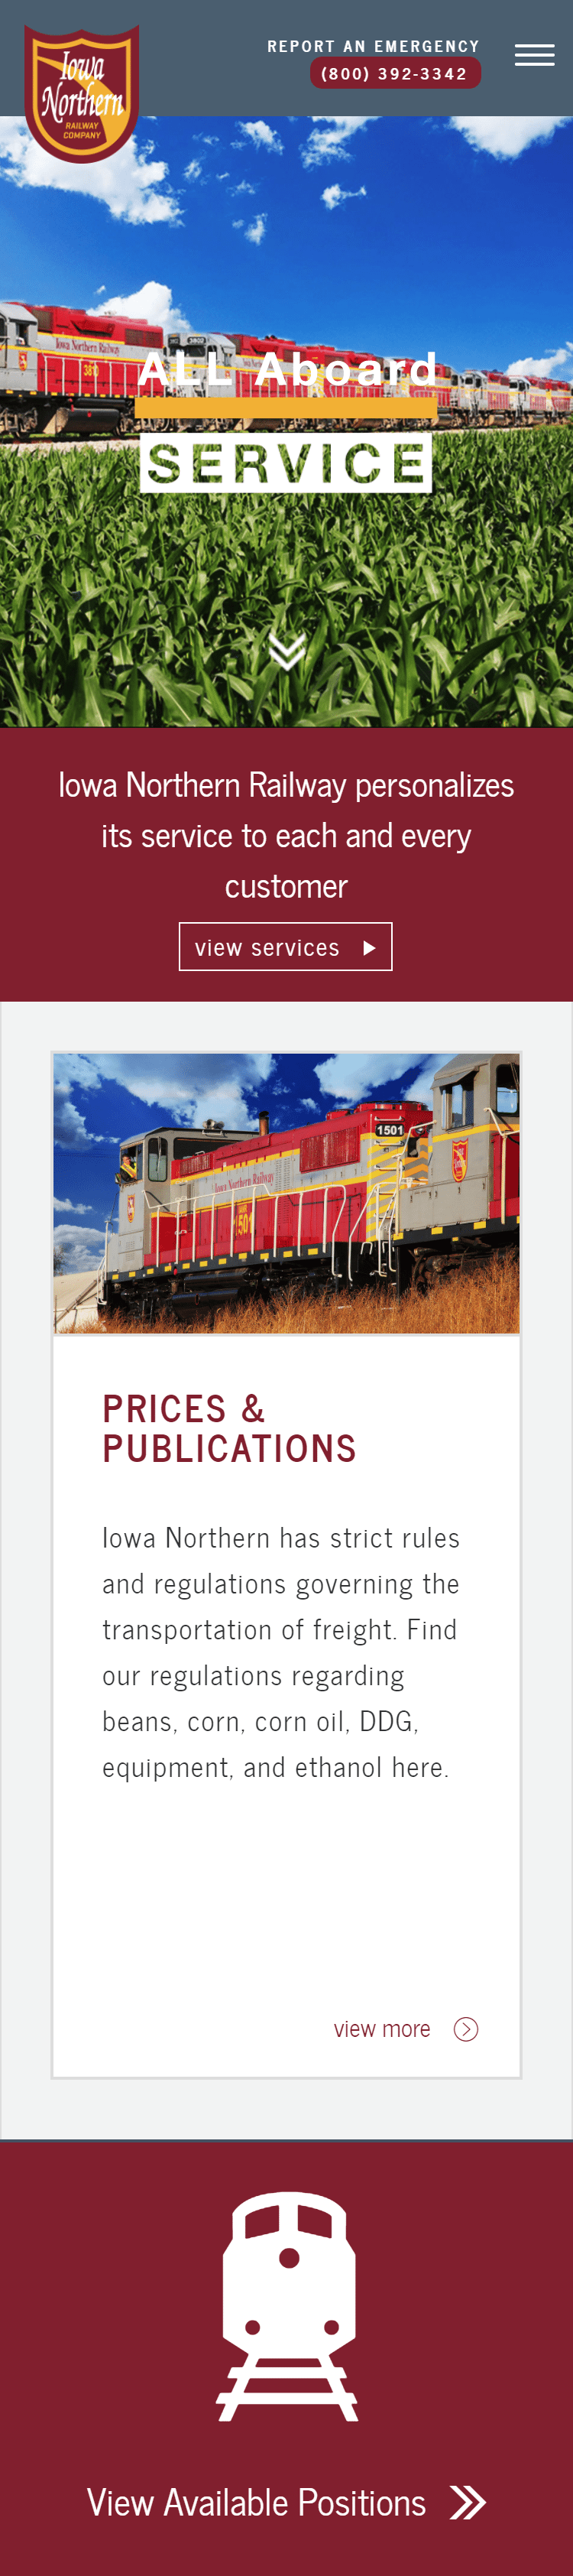 Iowa Northern Tablet Website View